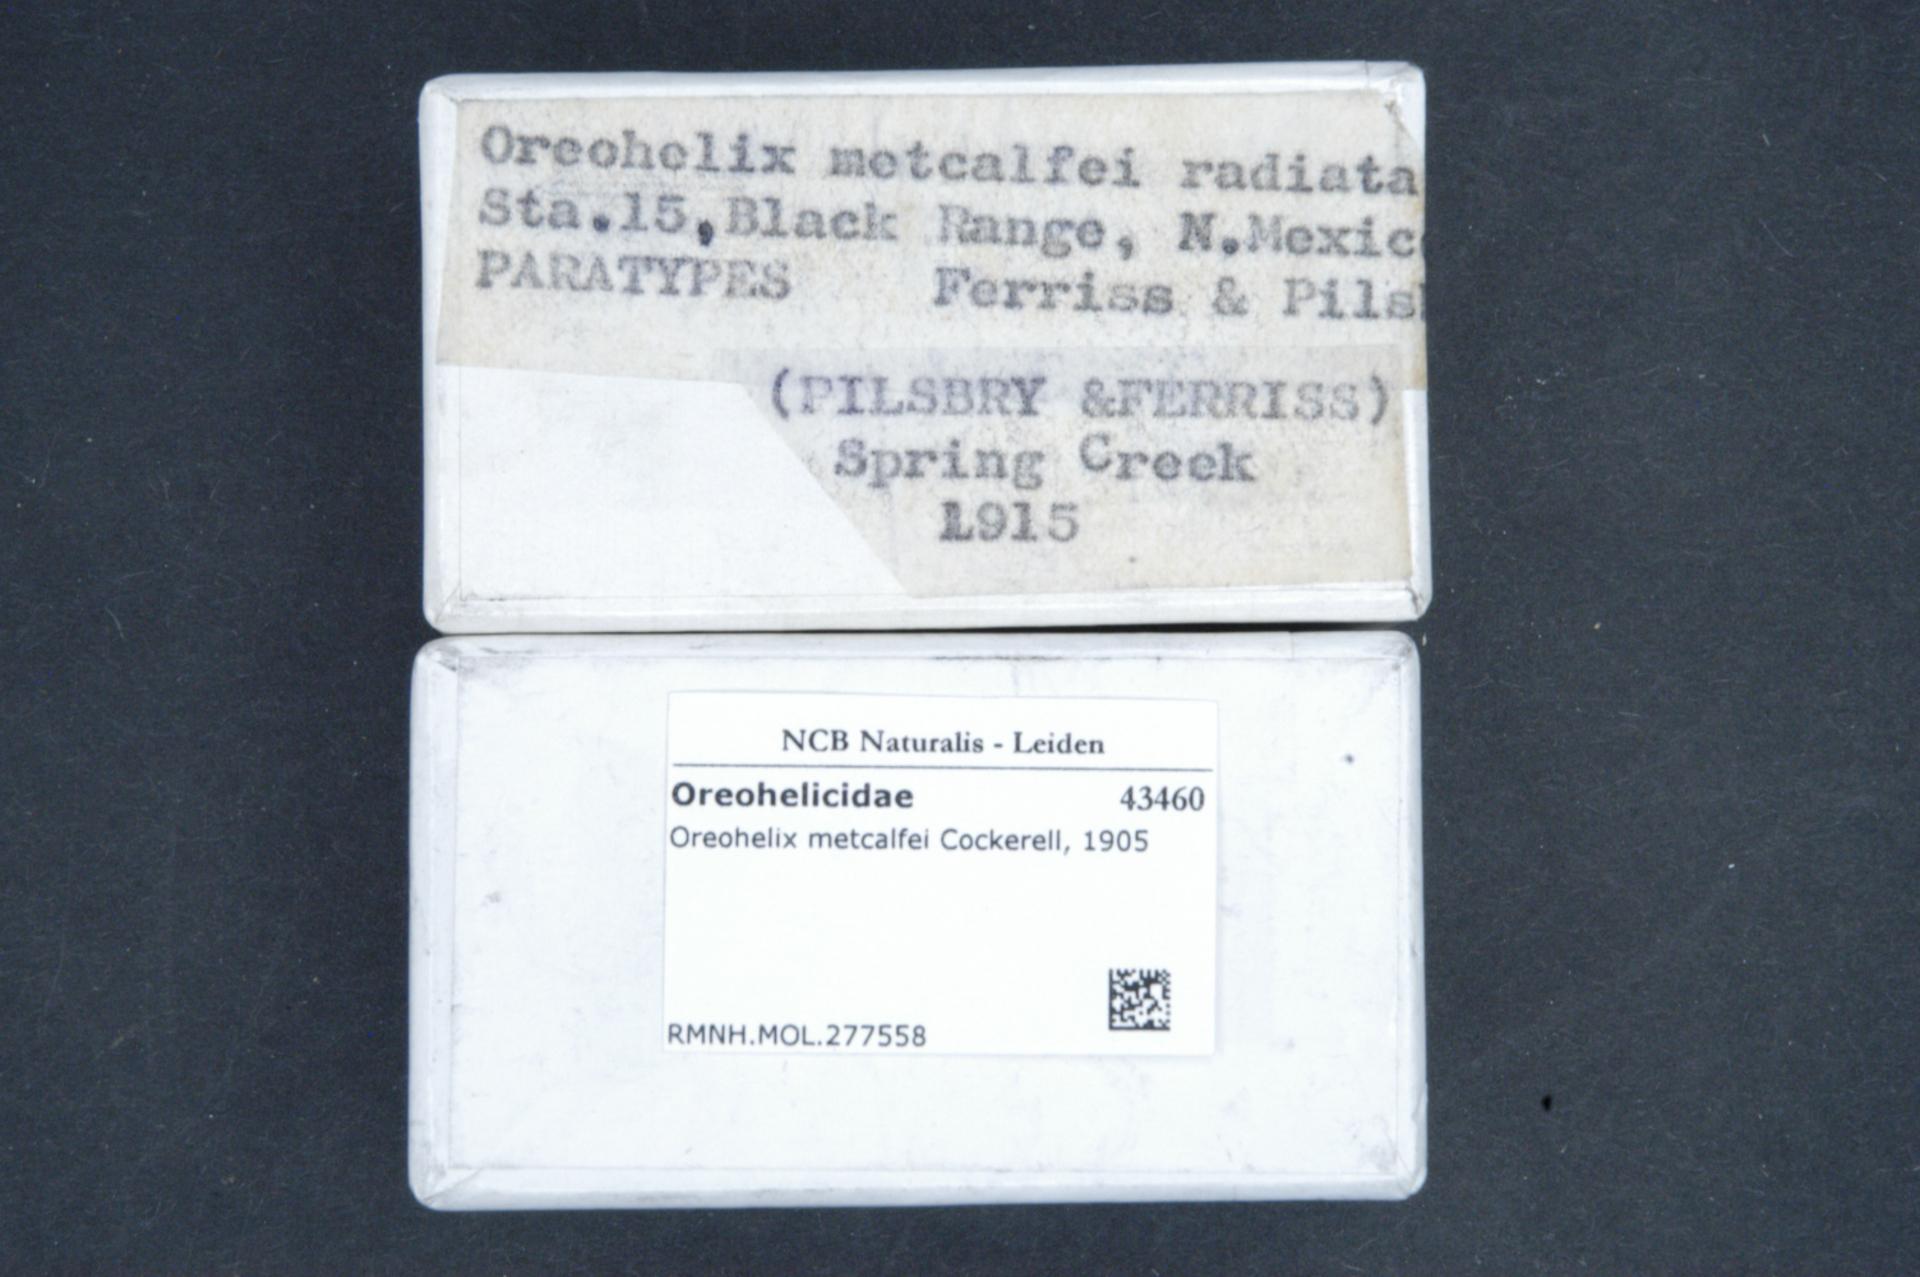 RMNH.MOL.277558   Oreohelix metcalfei radiata Pilsbry & Ferriss, 1917